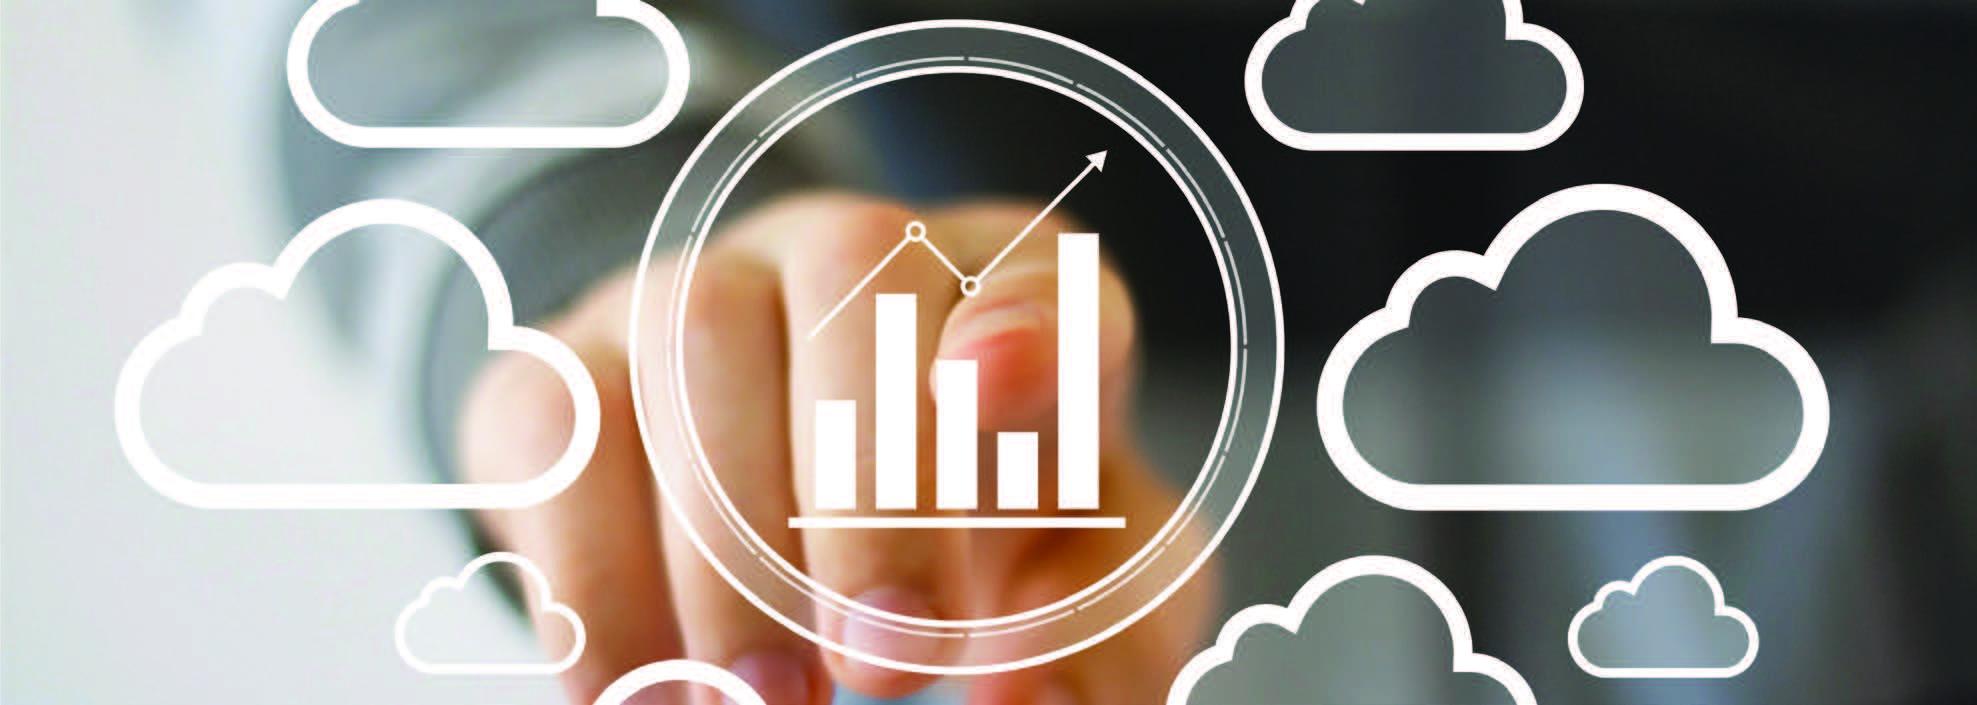 https://d2adhoc2vrfpqj.cloudfront.net/2020/10/Cloud-Governance.jpg